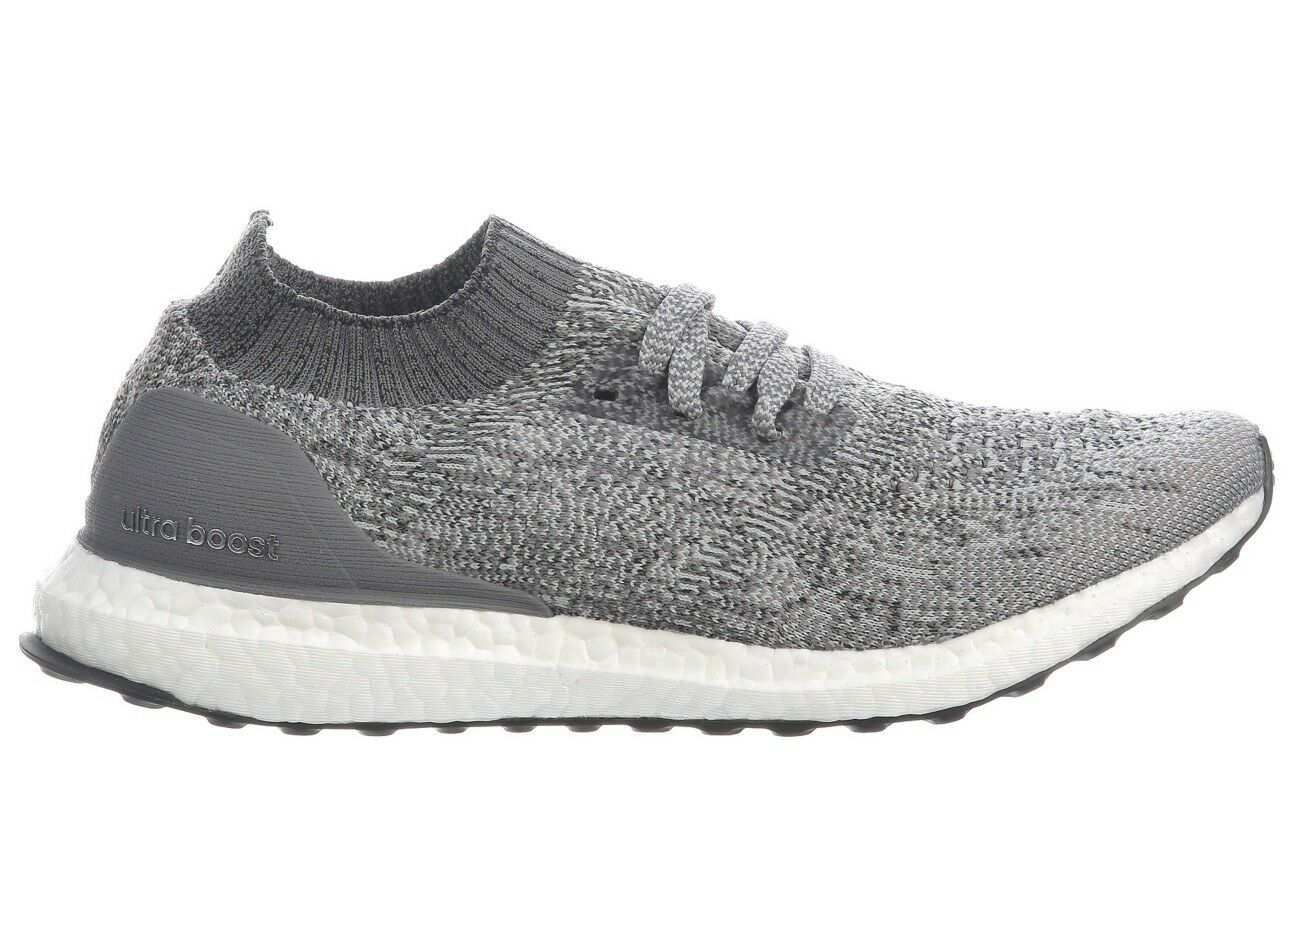 d6b559329f135 ... greece adidas ultra boost uncaged mens da9159 grey primeknit running  shoes size 10 e947e 2ec68 ...